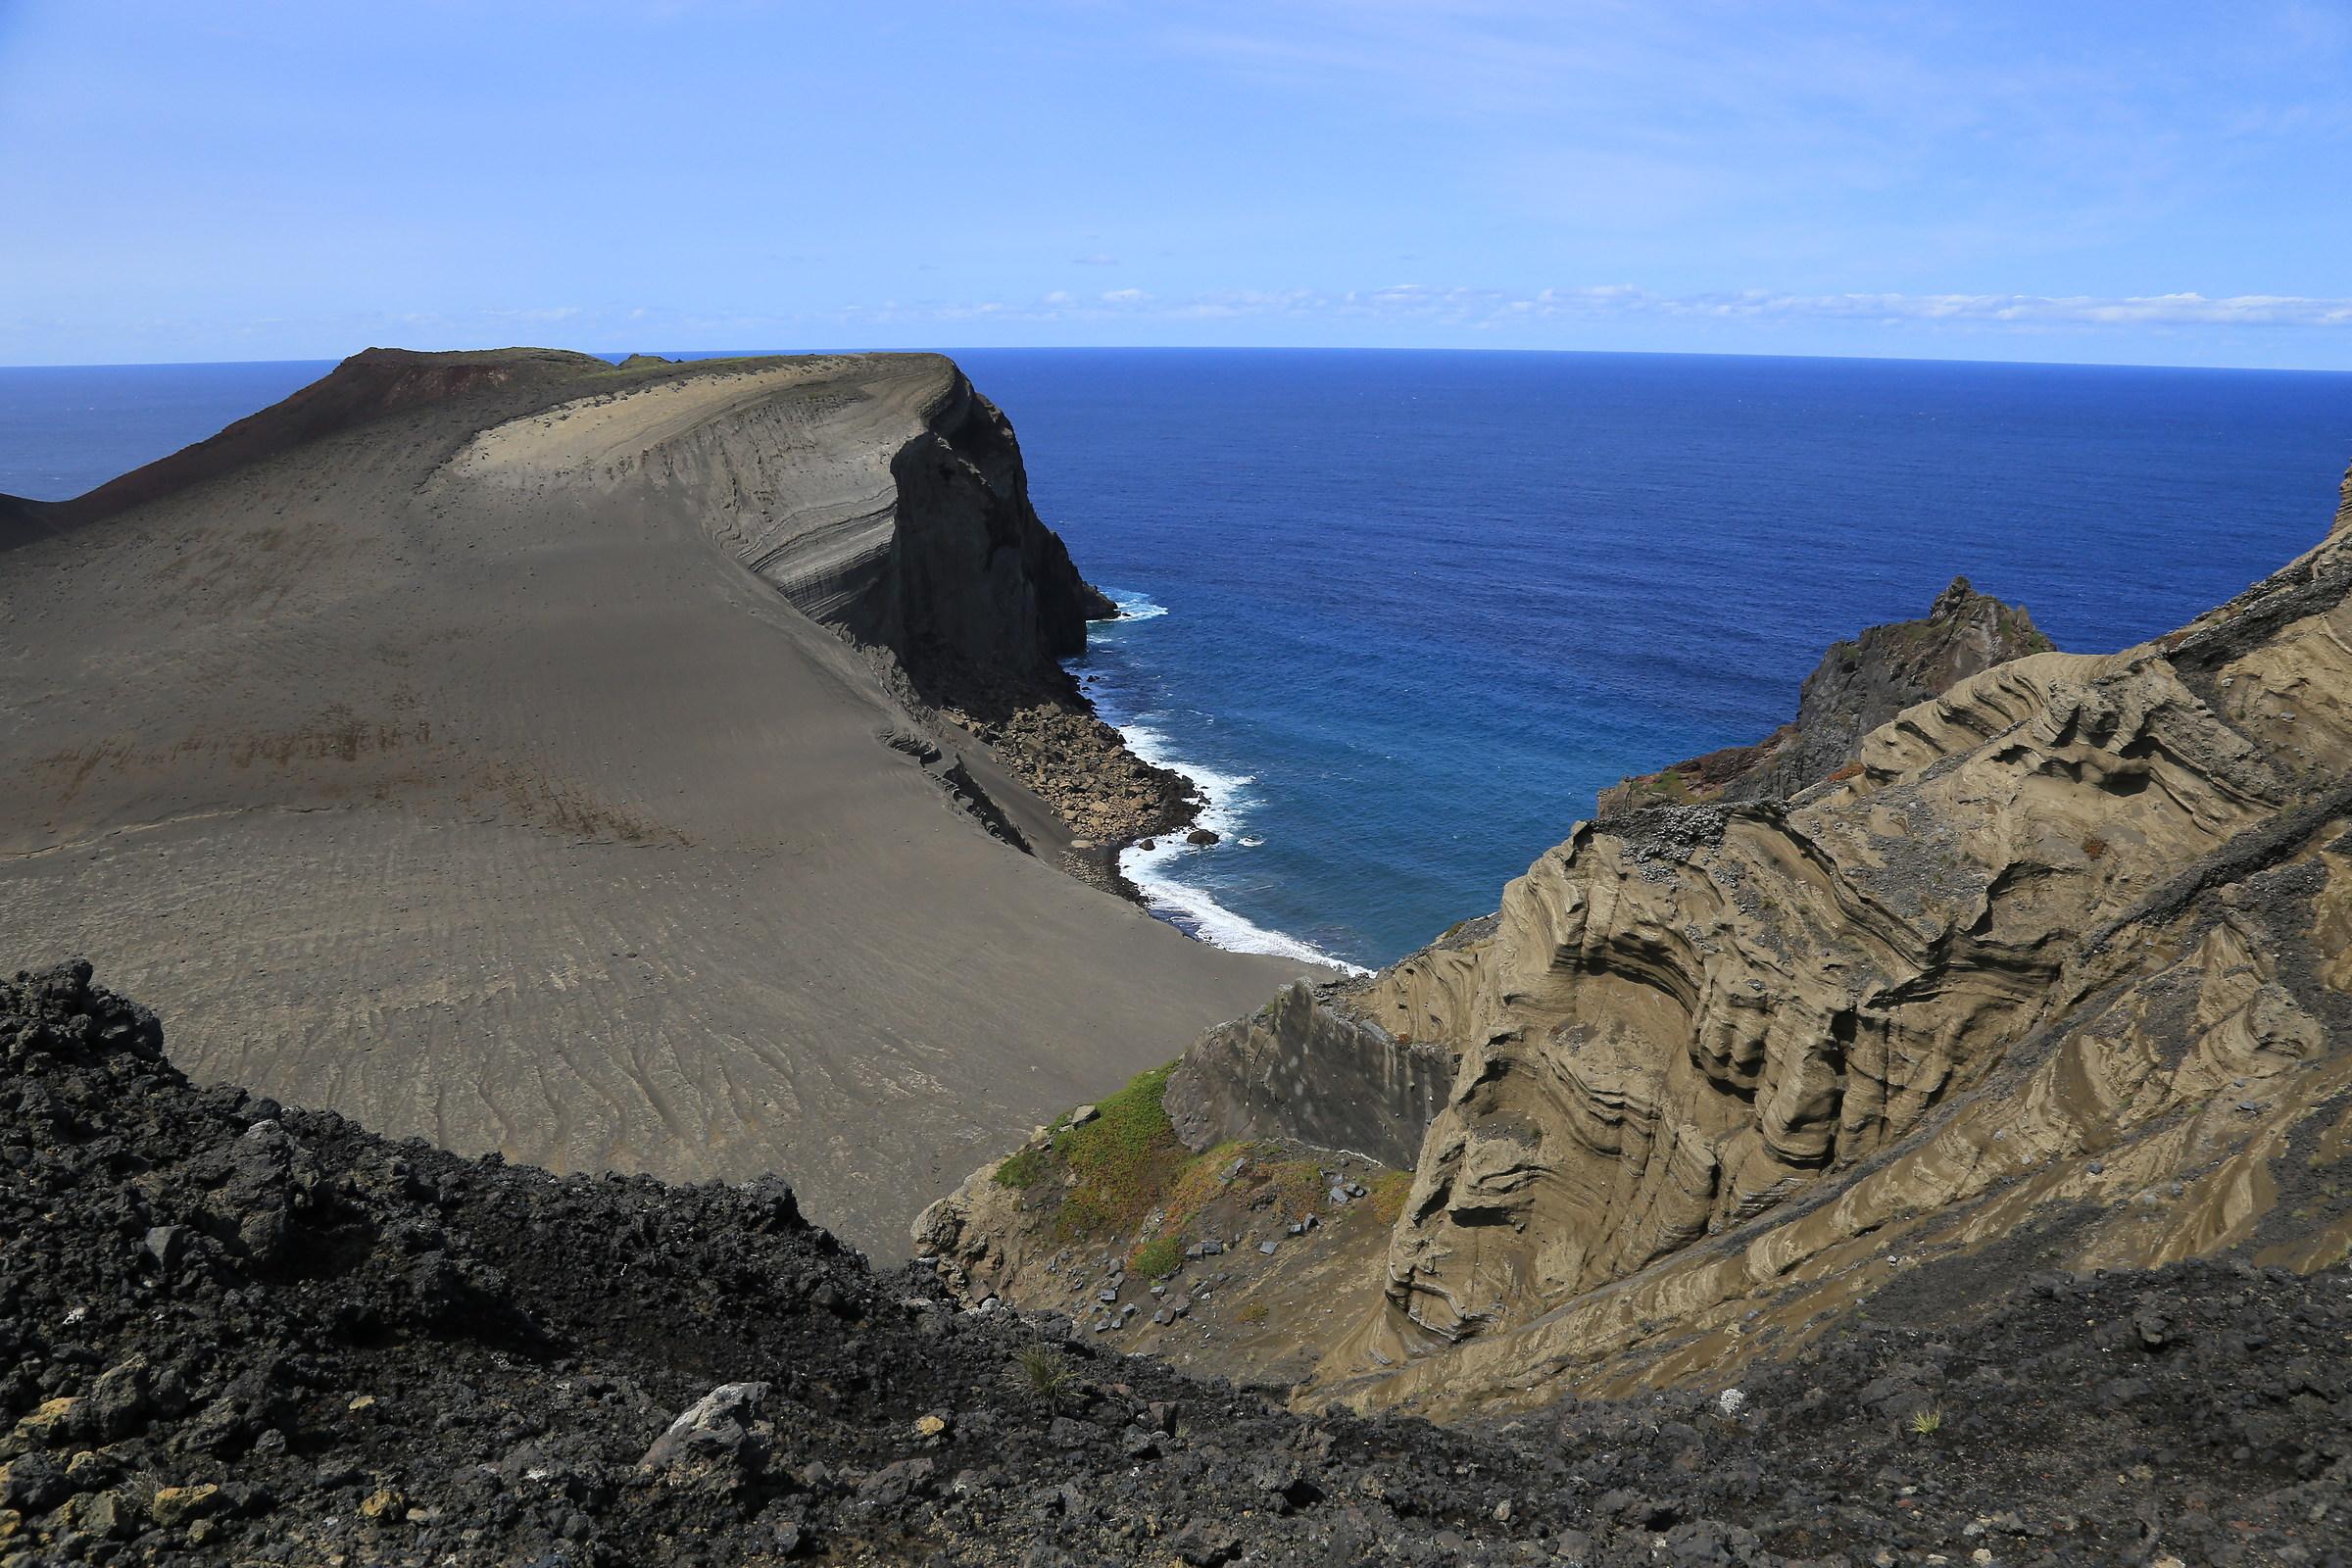 Cenere vulcanica juzaphoto for Cenere vulcanica